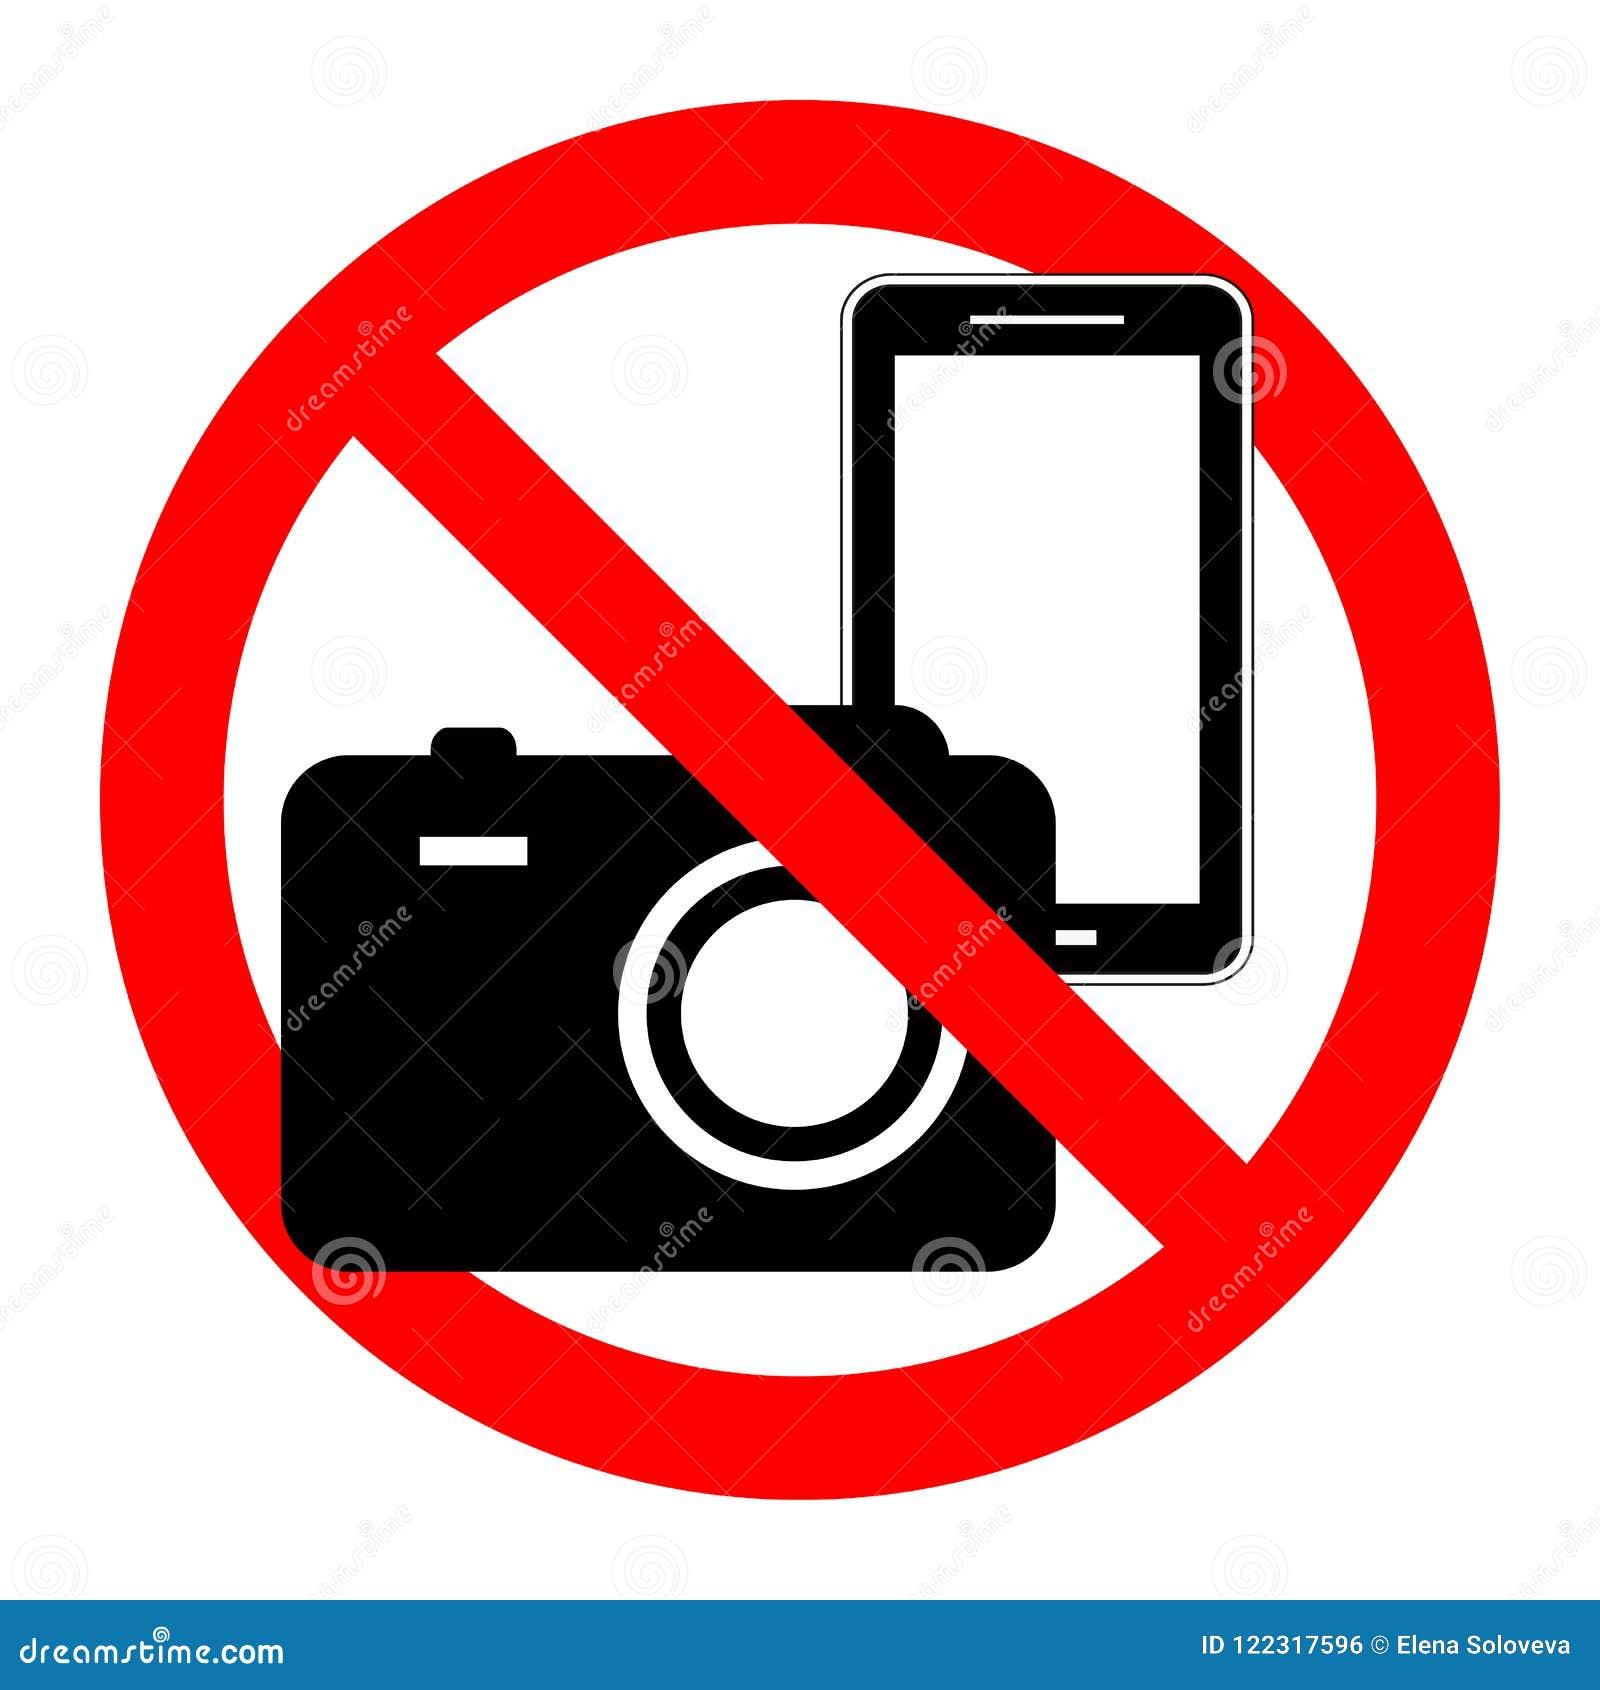 No camera symbol on white background. vector illustration.